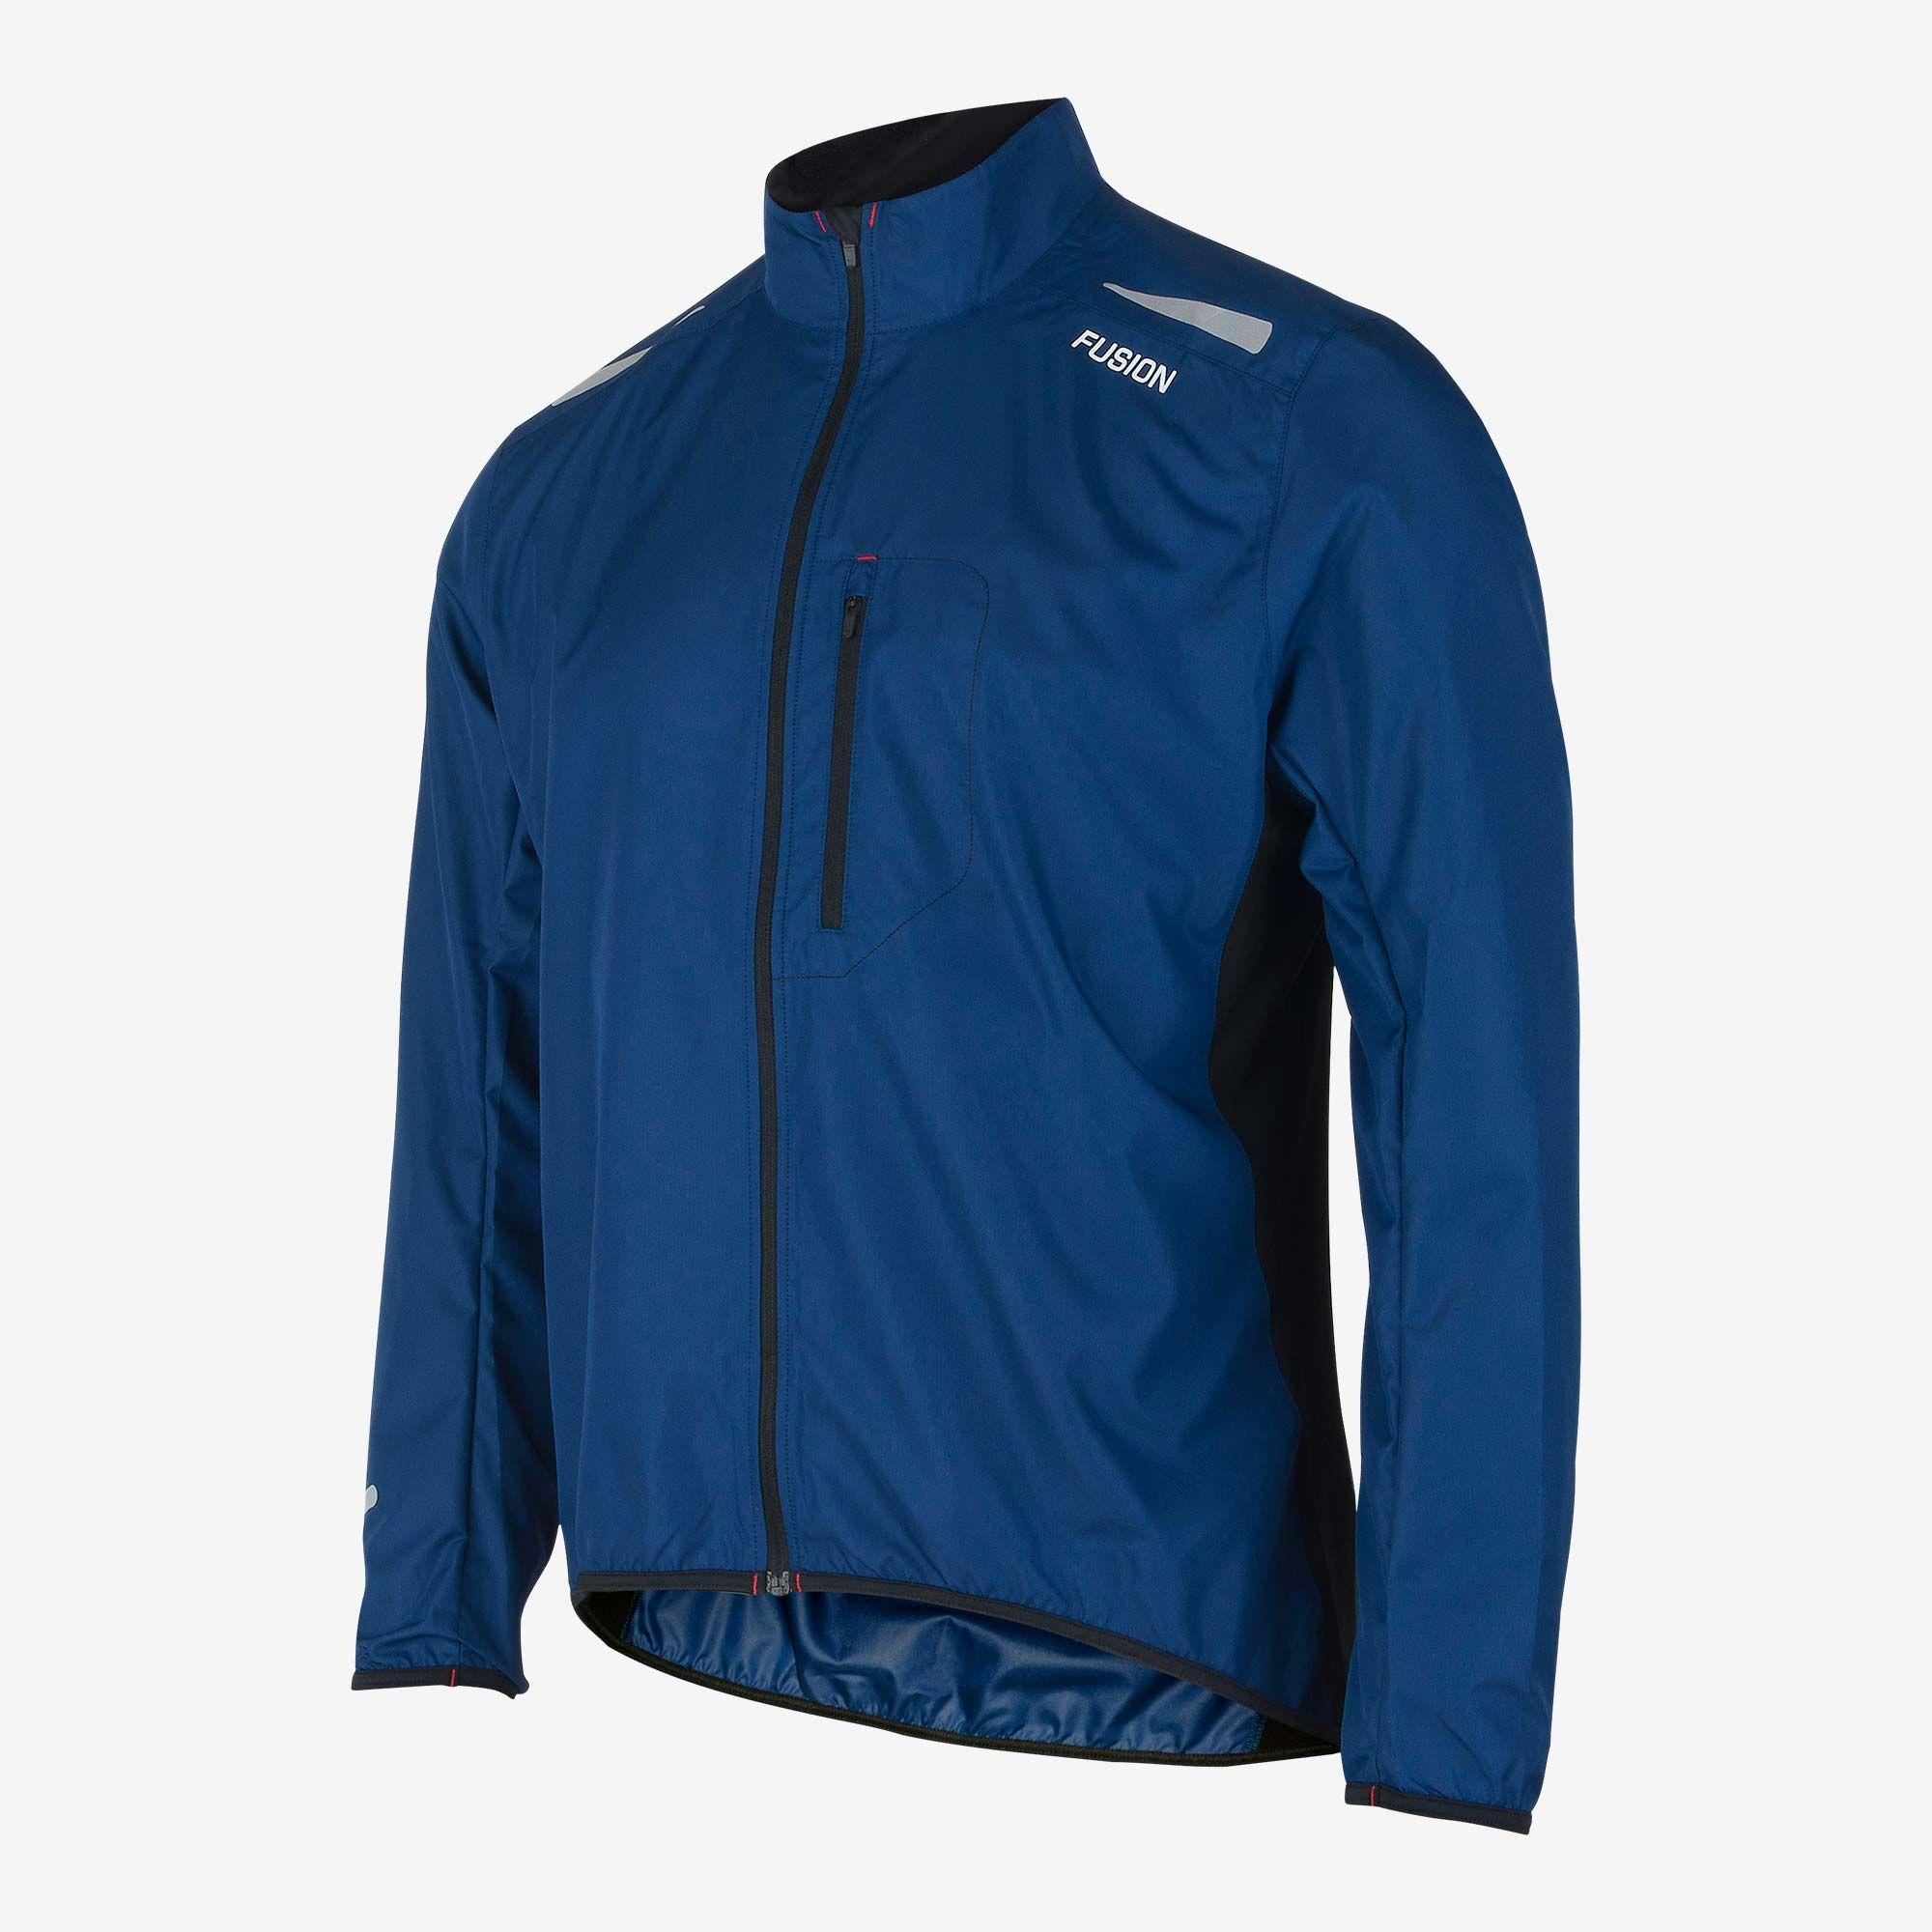 Fusion S1 Run Jacket (Night Blue)